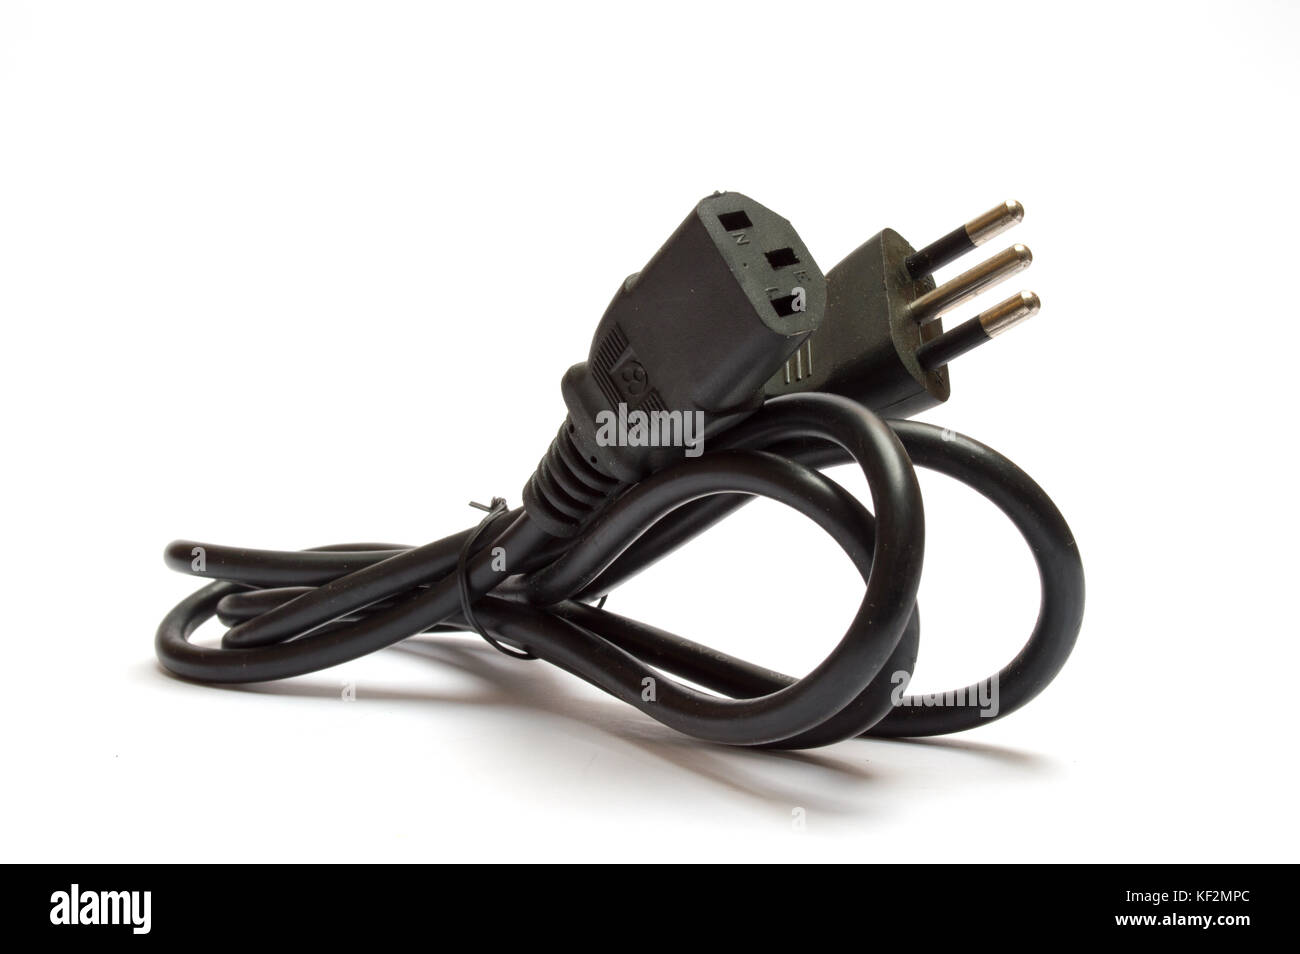 Electrical plug on white background Stock Photo